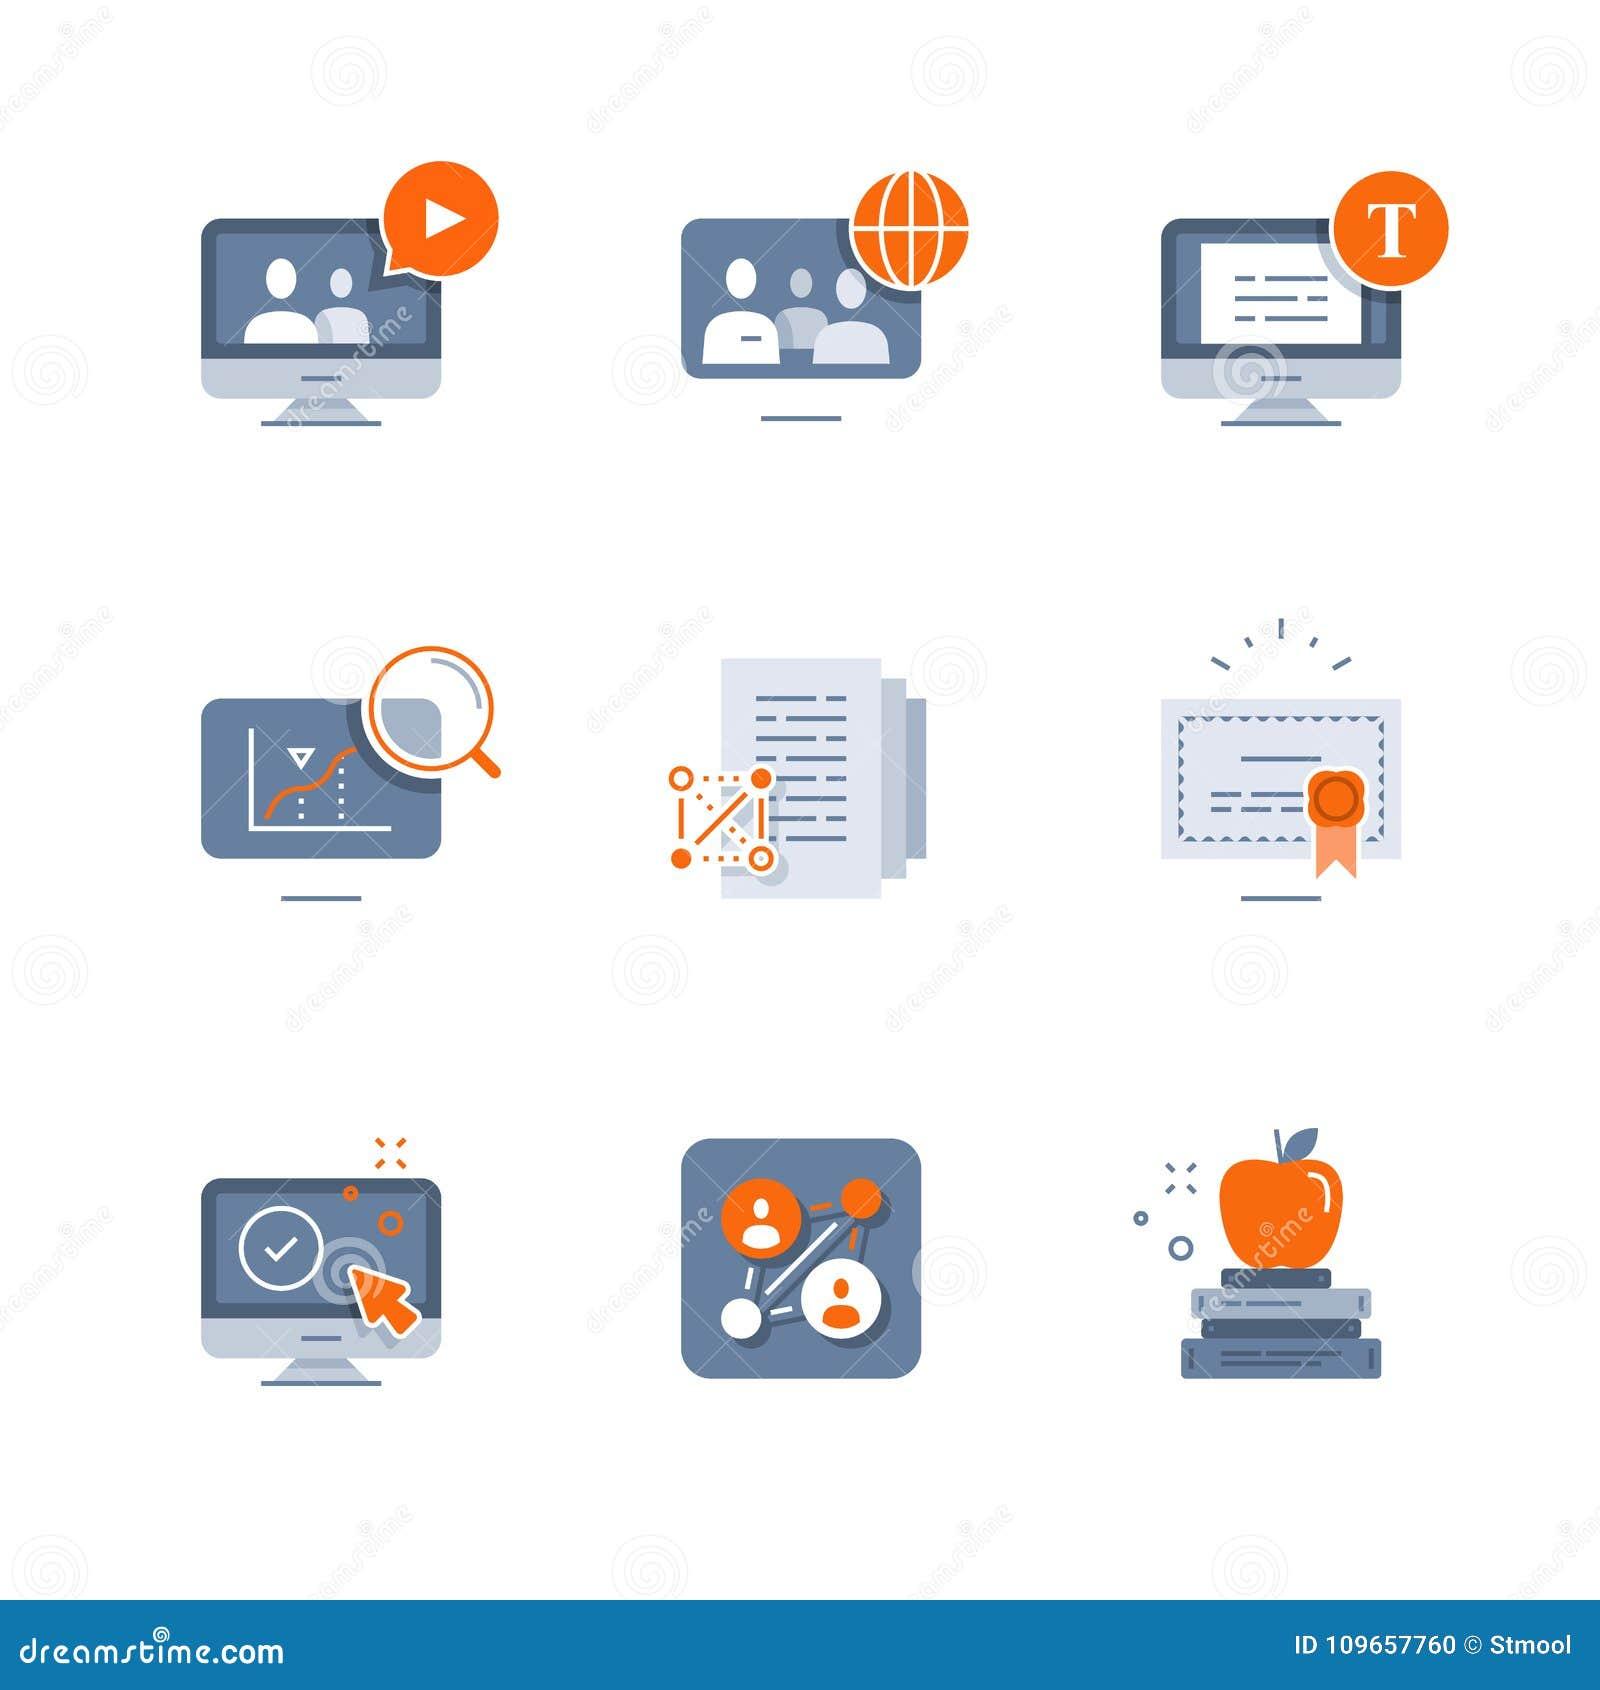 Exam Preparation, Online Education, Video Course, Global Community